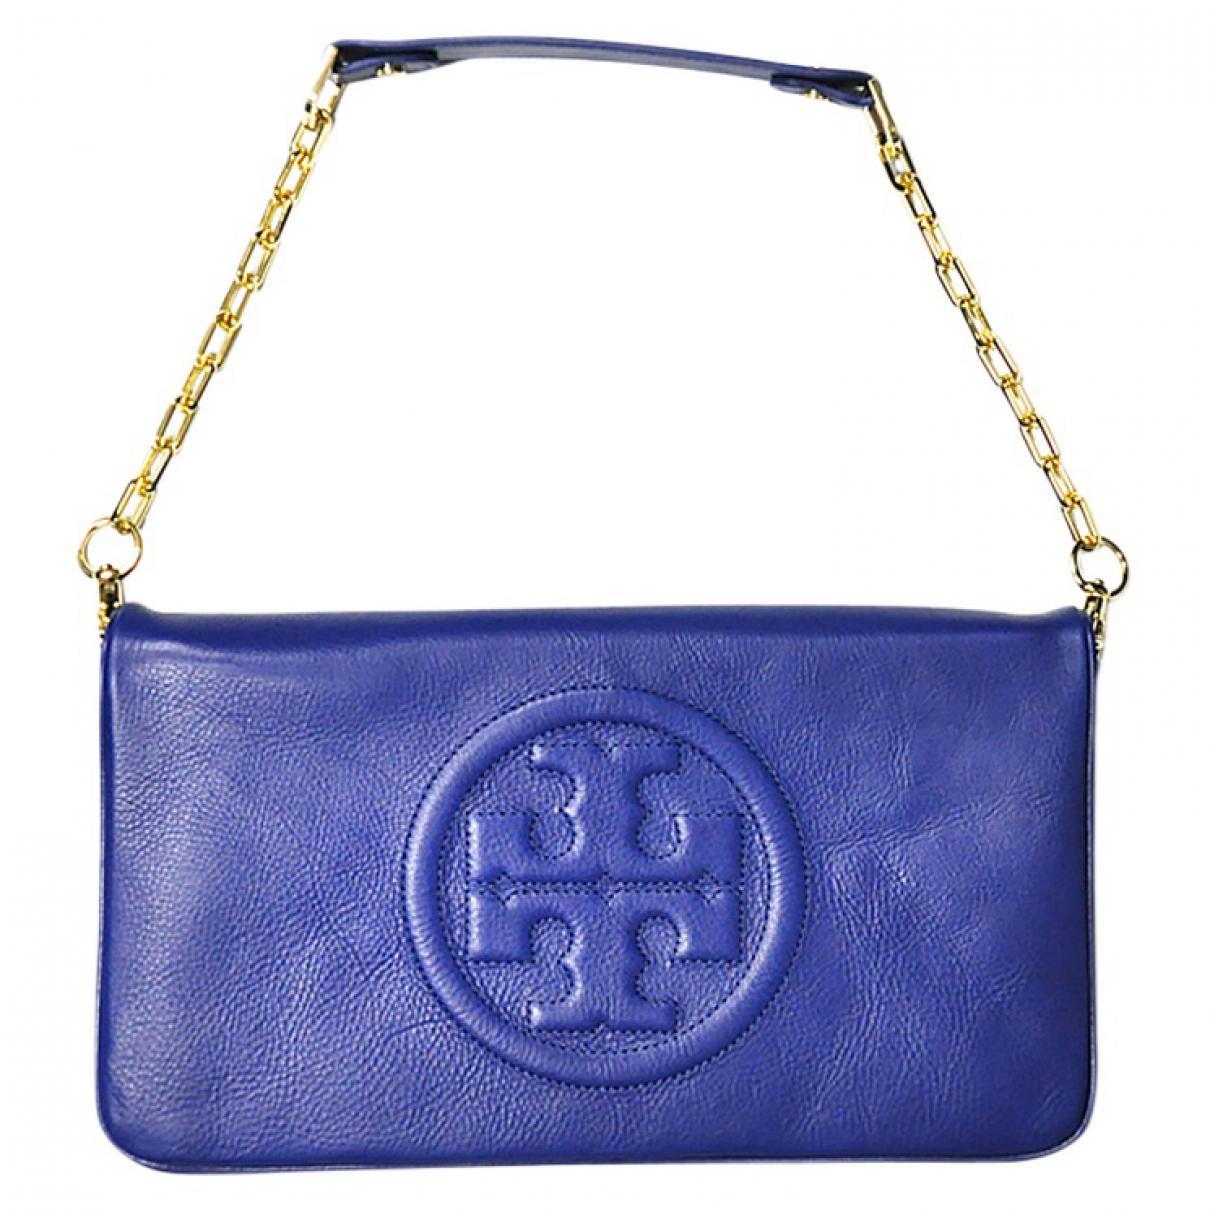 9ea0e0f7d6b0 Tory Burch Pre-owned Blue Leather Clutch Bags in Blue - Lyst